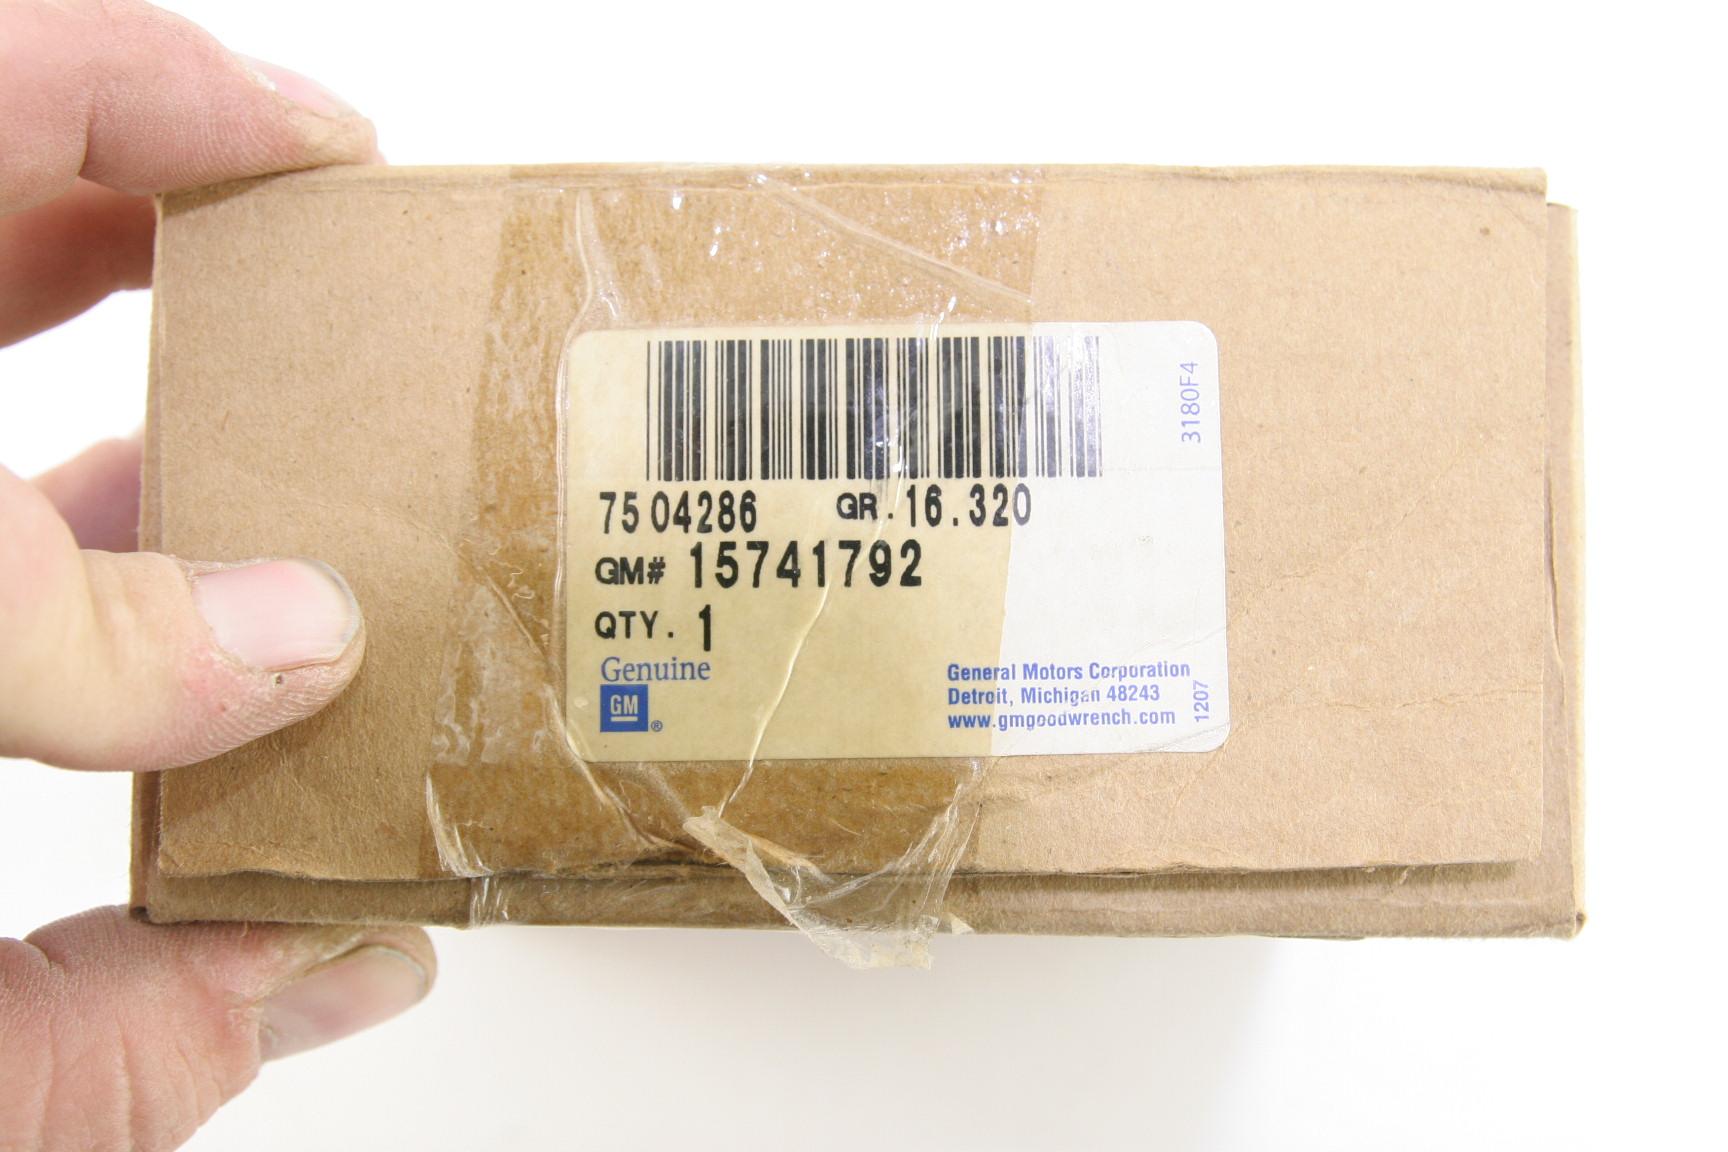 ***~ New OEM 15741792 GM Back Door Upper Hinge Fast Free Shipping - image 2